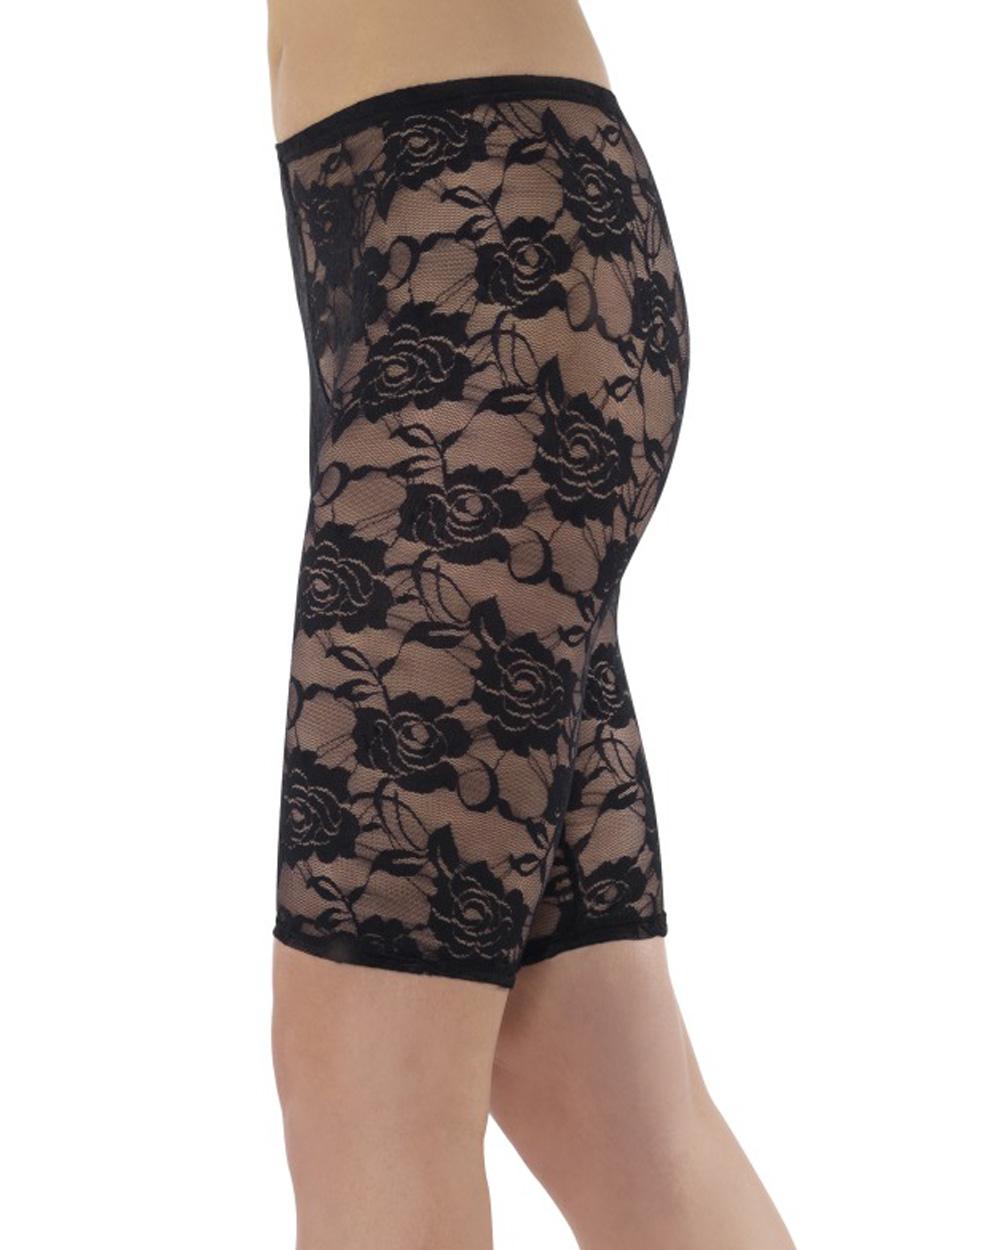 A566 Ladies 80u0026#39;s Cycling Shorts 1980u0026#39;s Disco Black Lace Leggings Fancy Costume